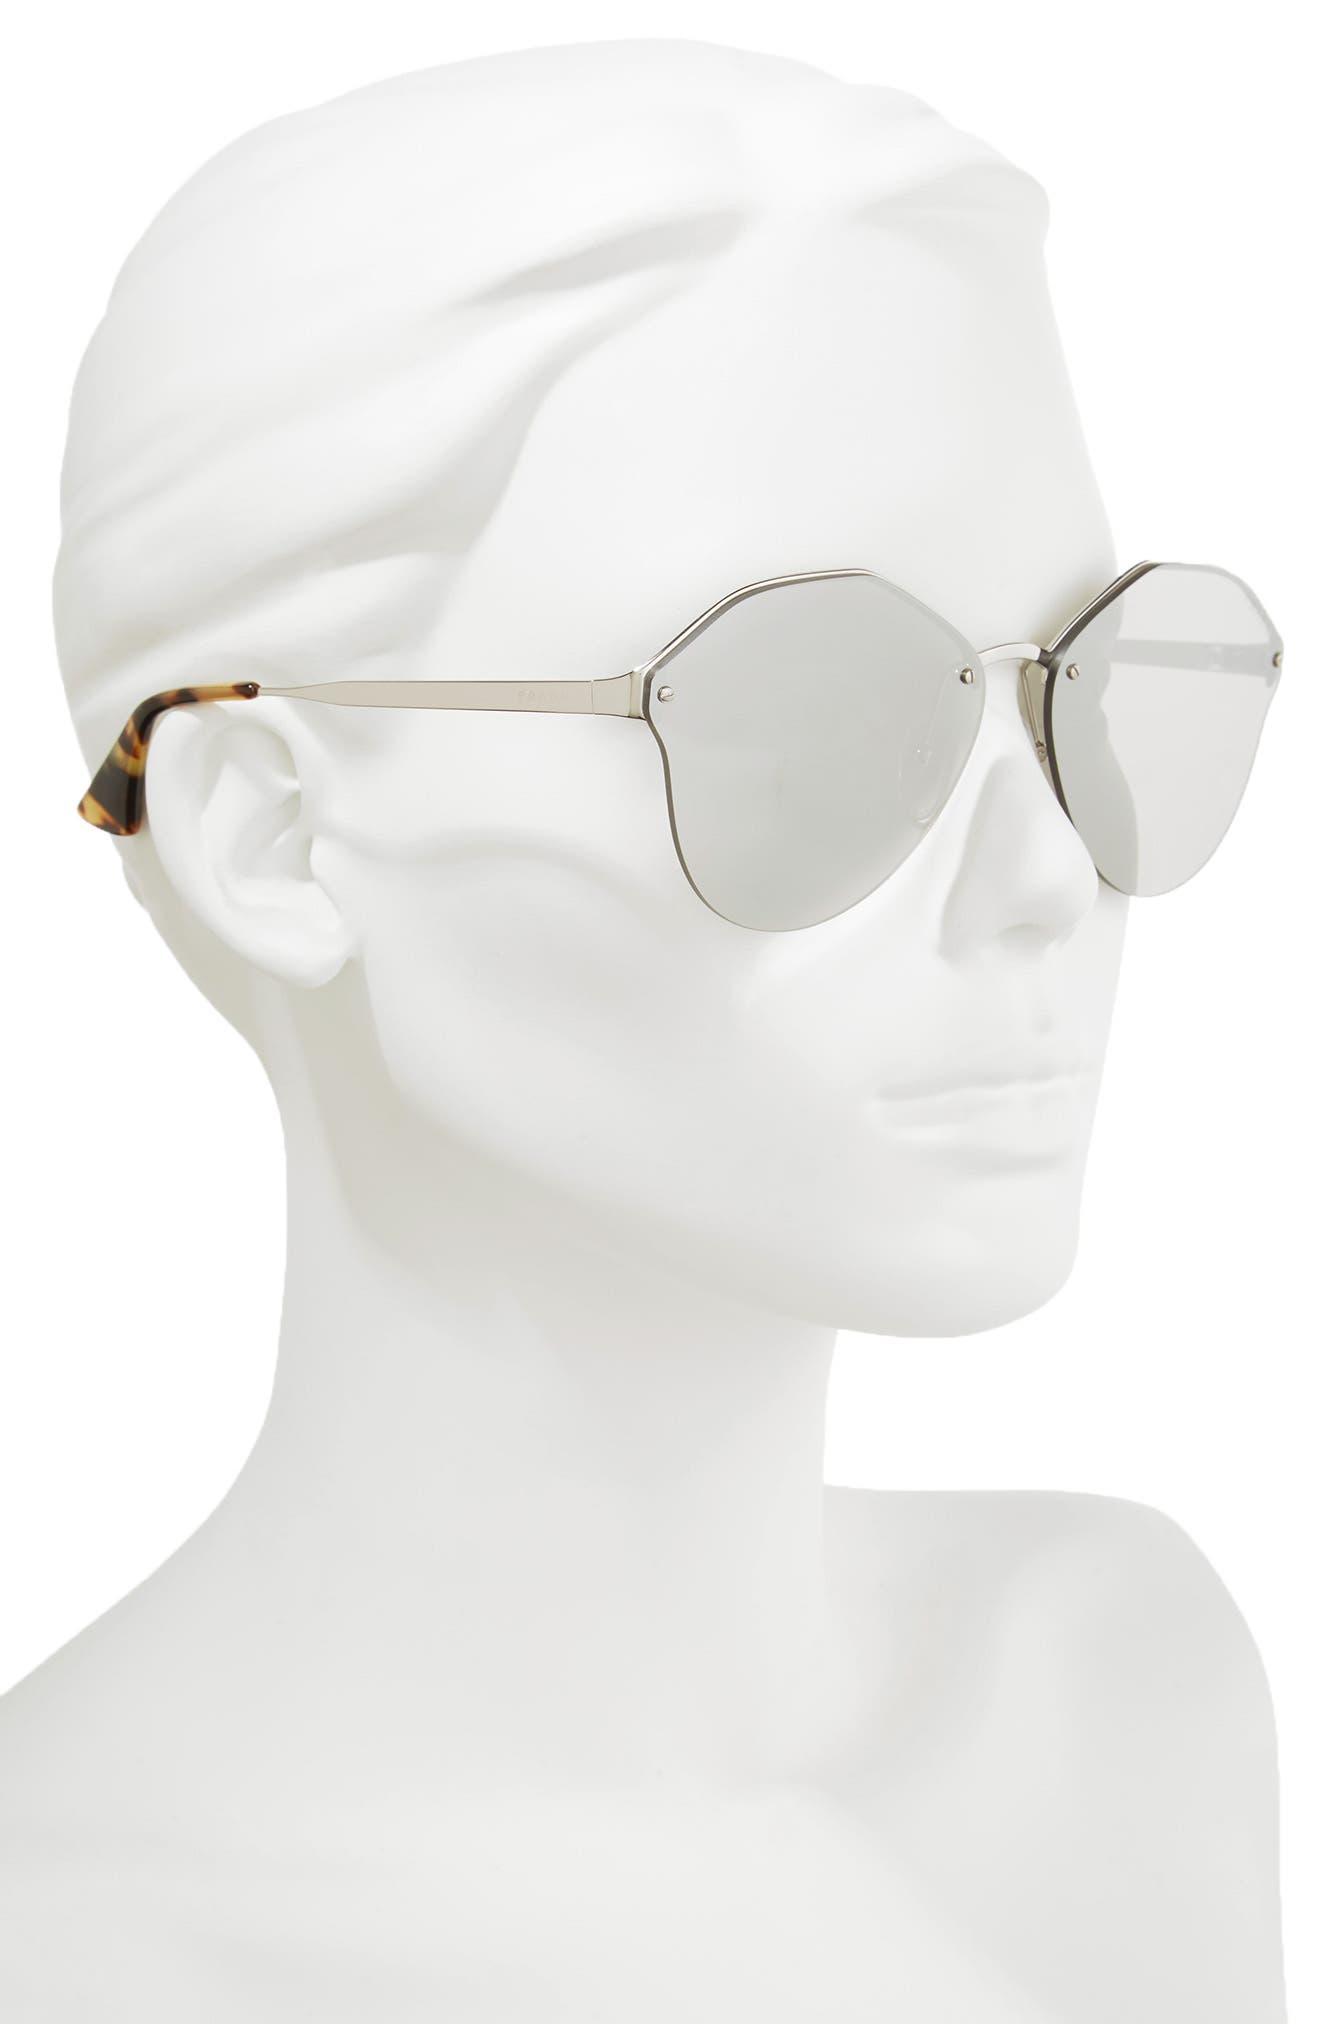 66mm Oversize Rimless Sunglasses,                             Alternate thumbnail 2, color,                             Brown Mirror